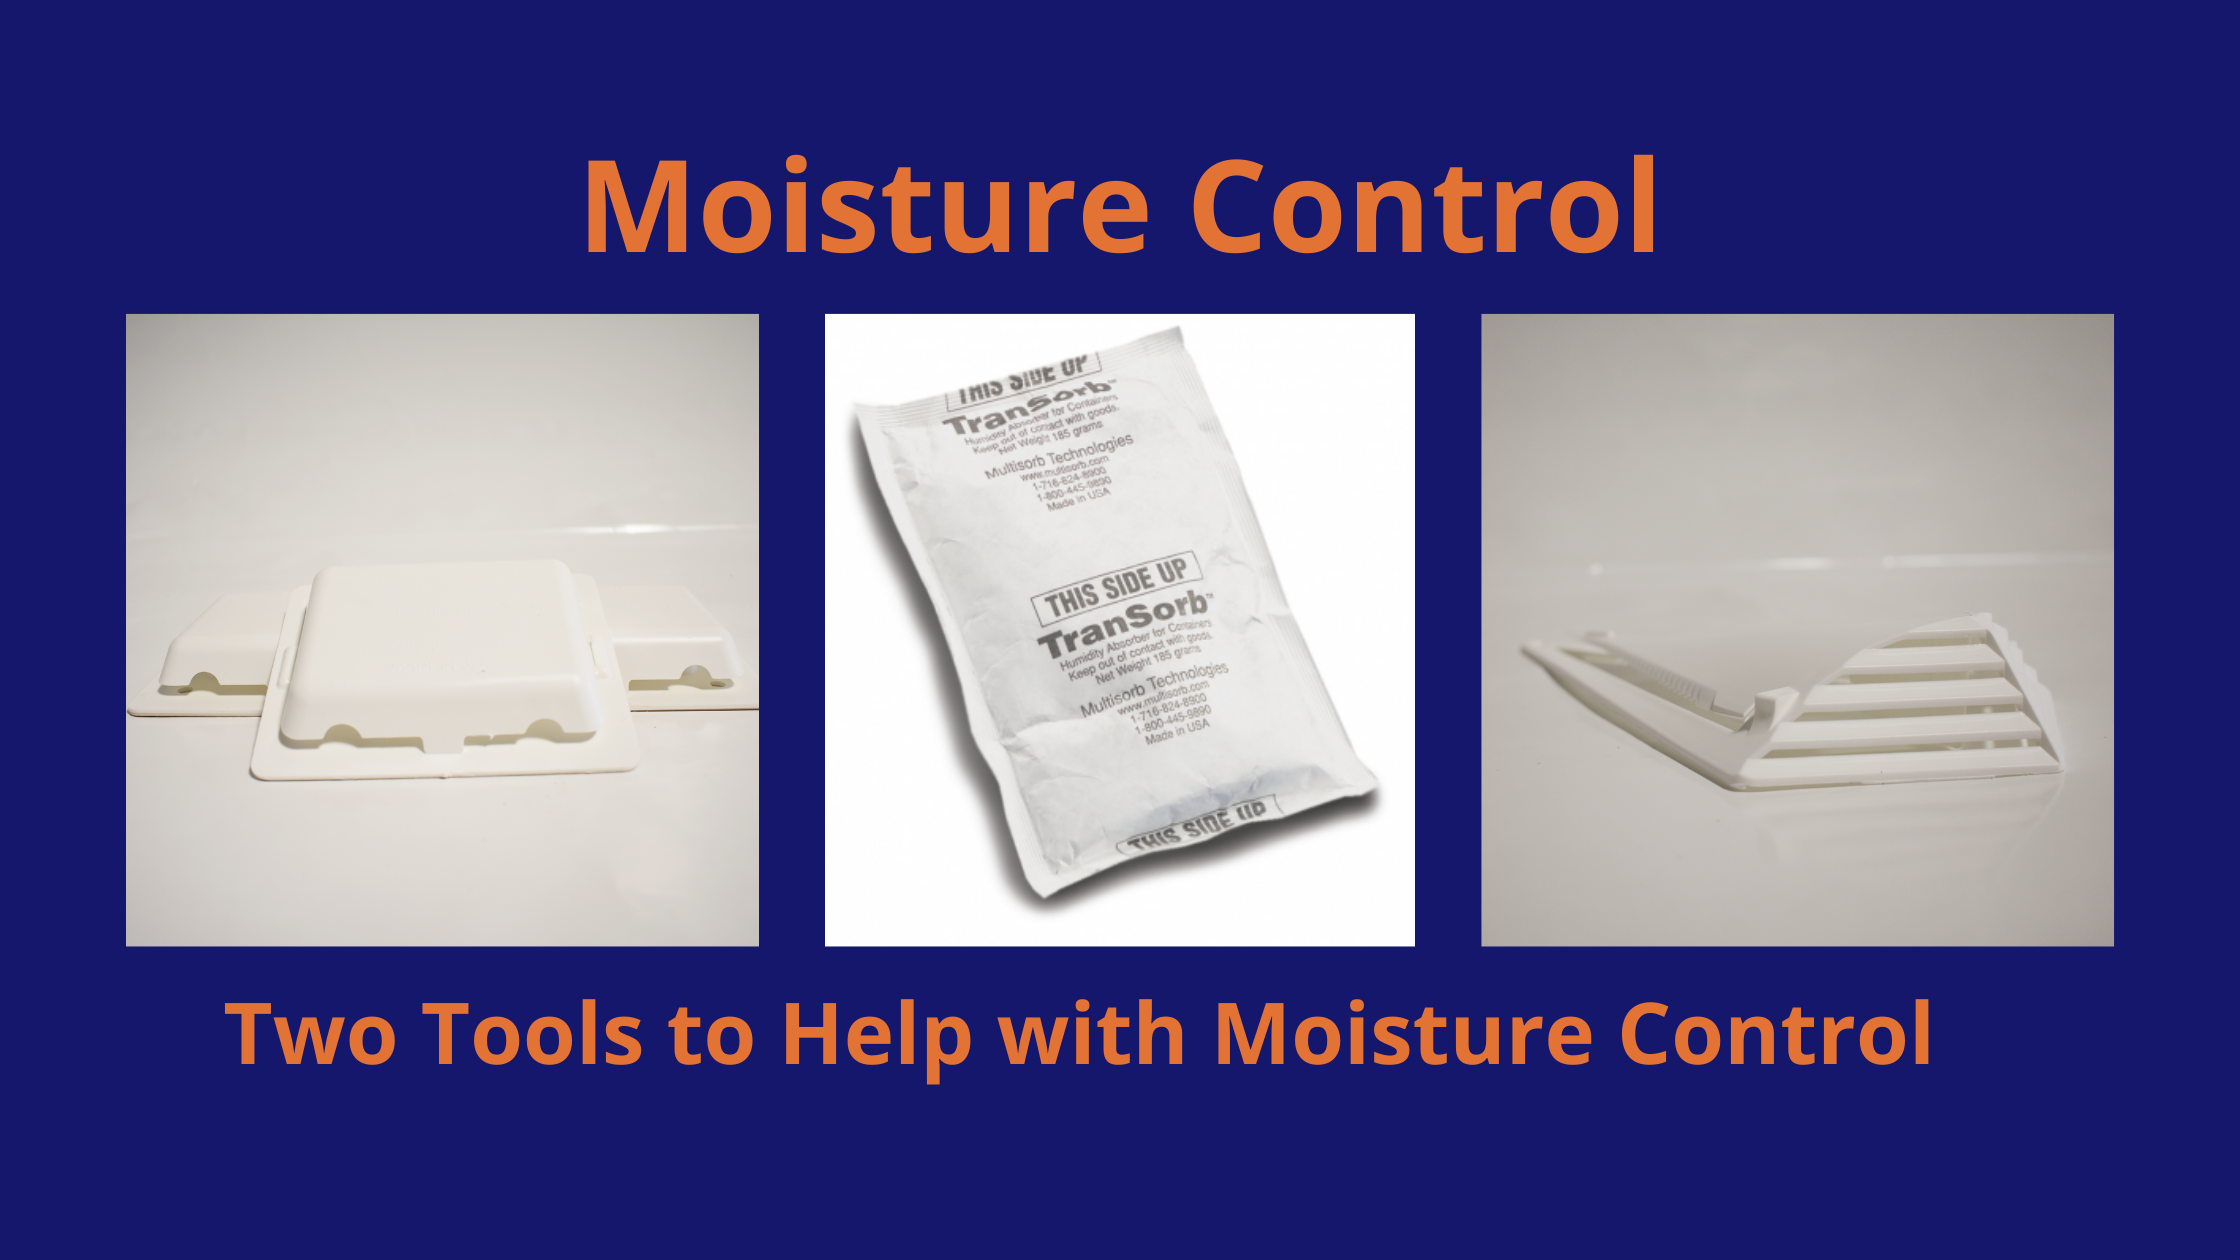 Moisture Control Tools